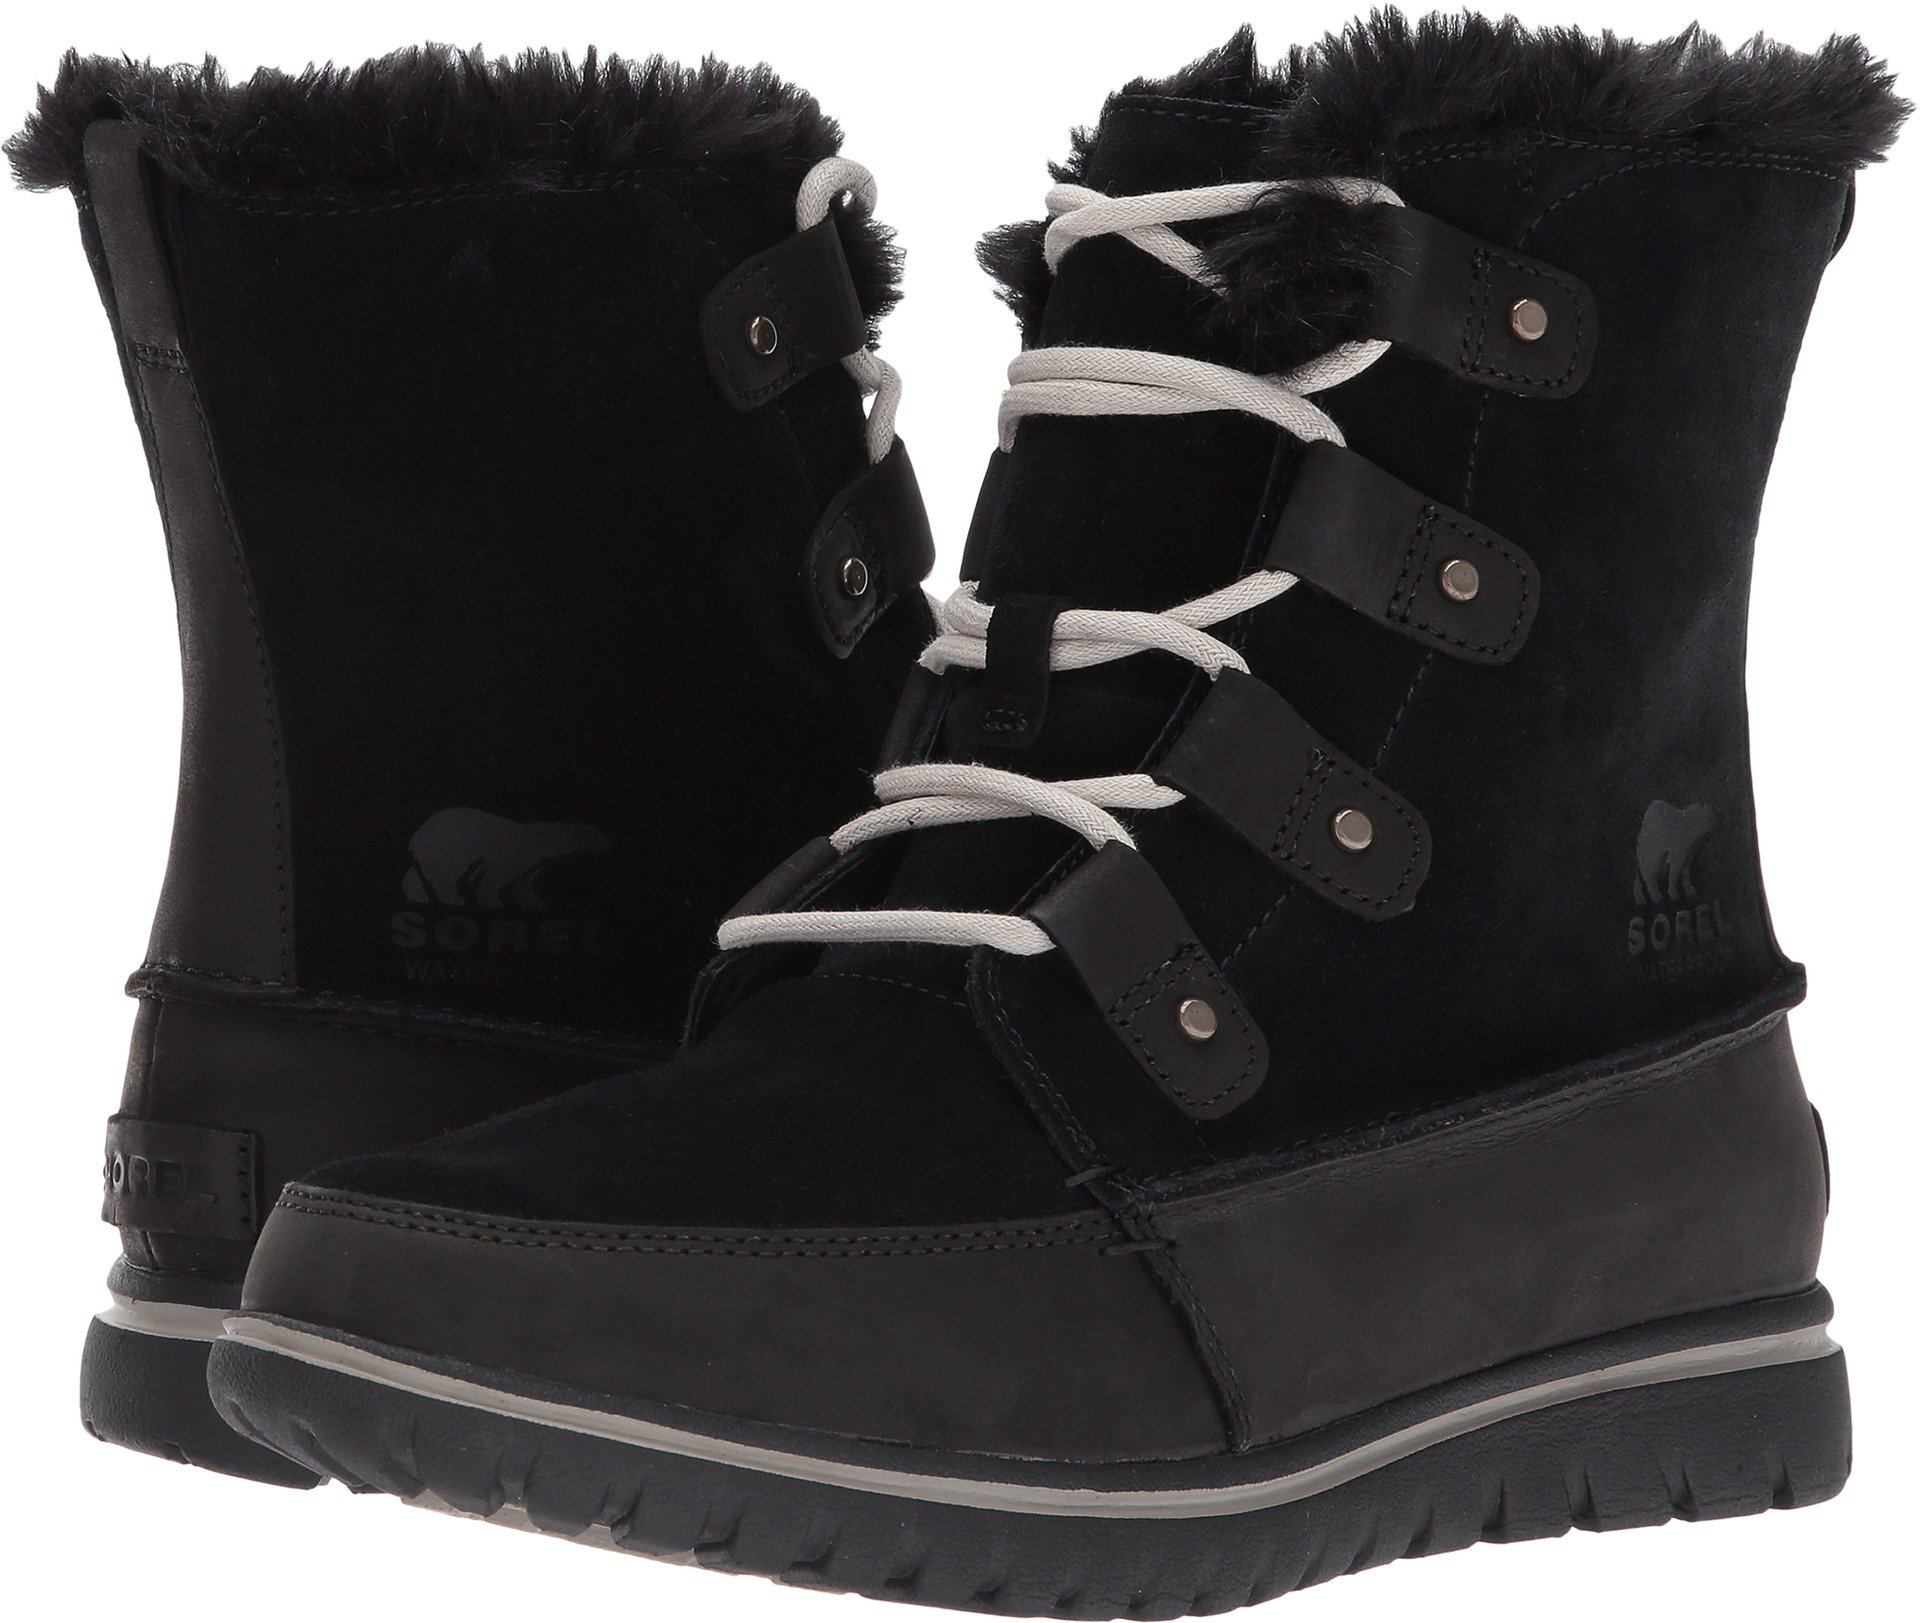 SOREL Women's Cozy Joan Black Boot